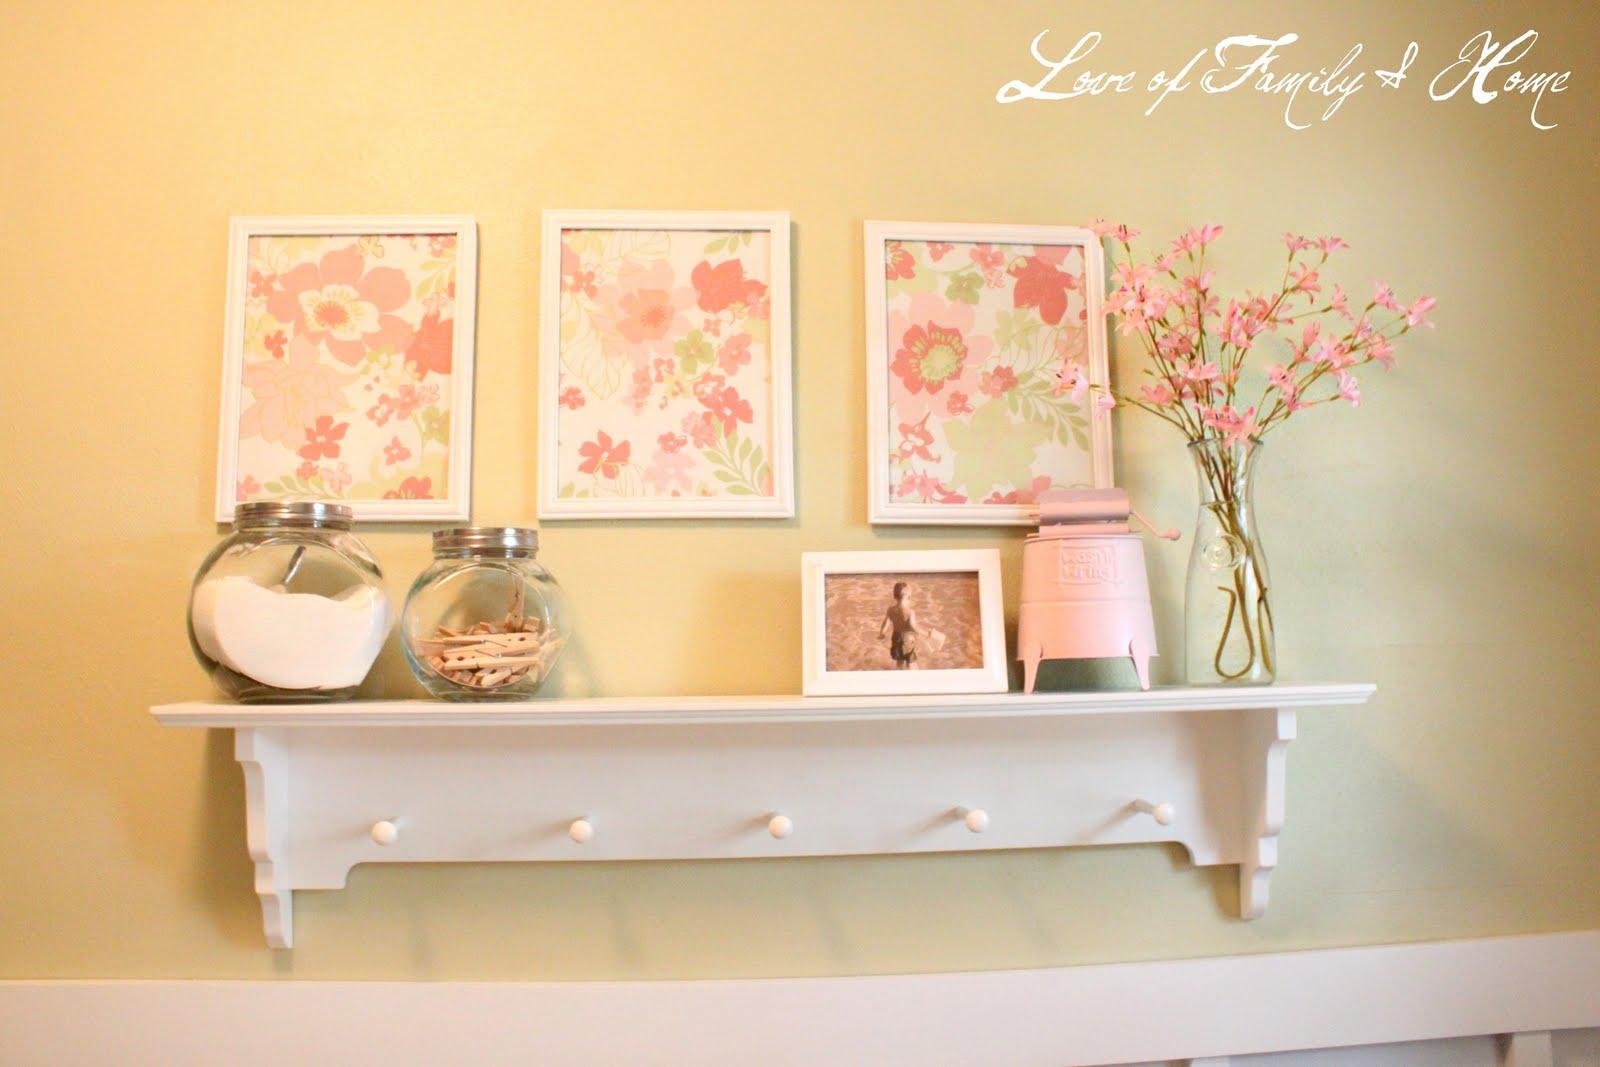 Diy Cheap Wall Art Love Of Family Home